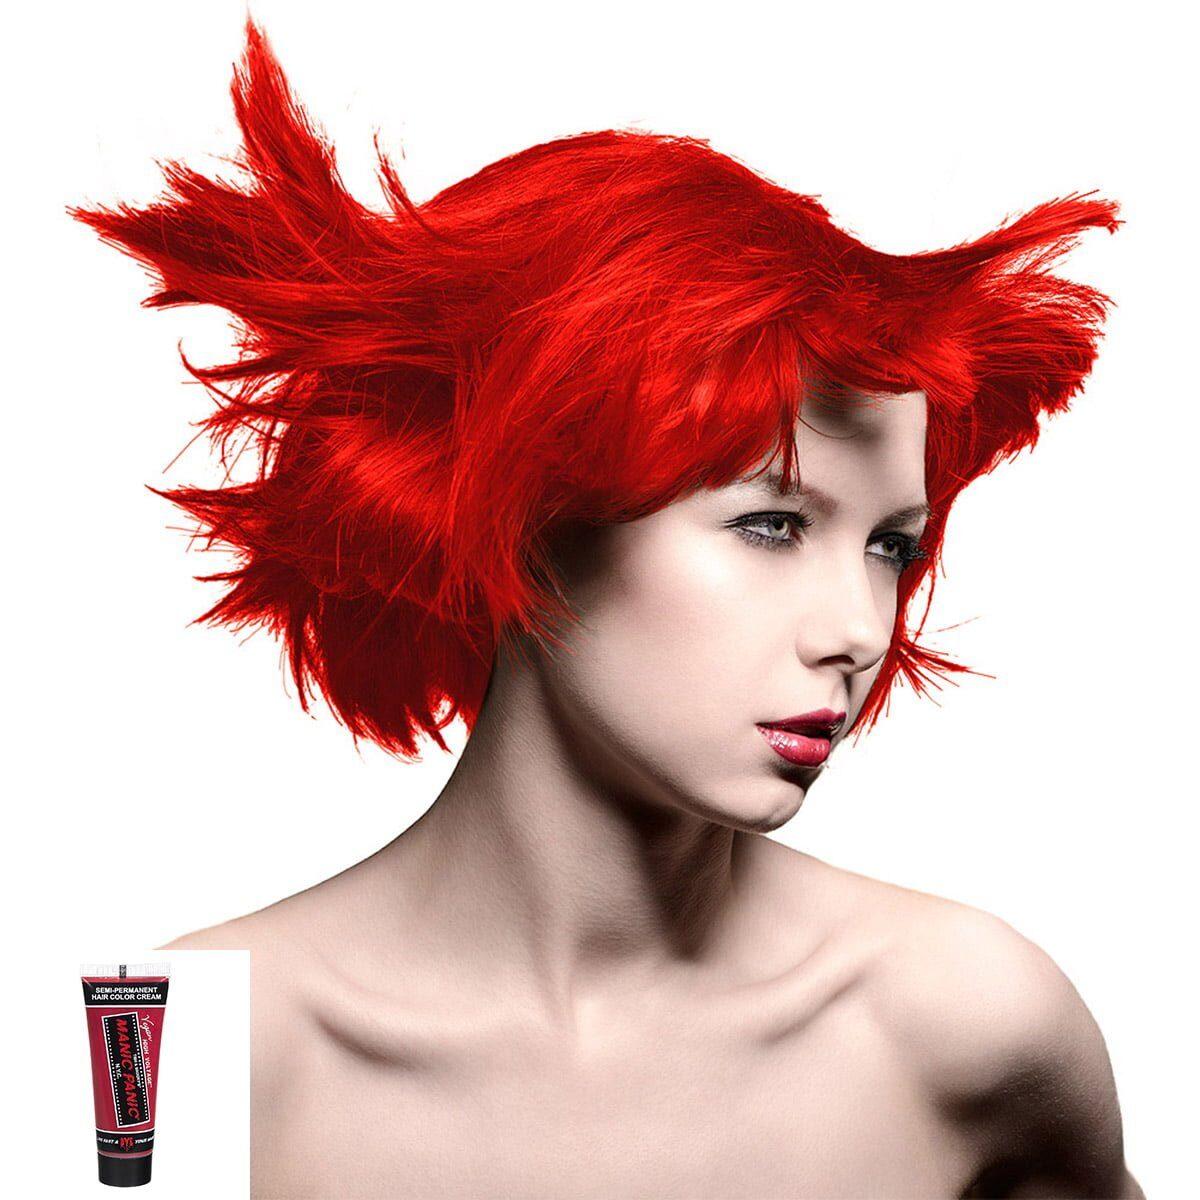 manic minis rød hårfargeprøve pillarbox red model 70592